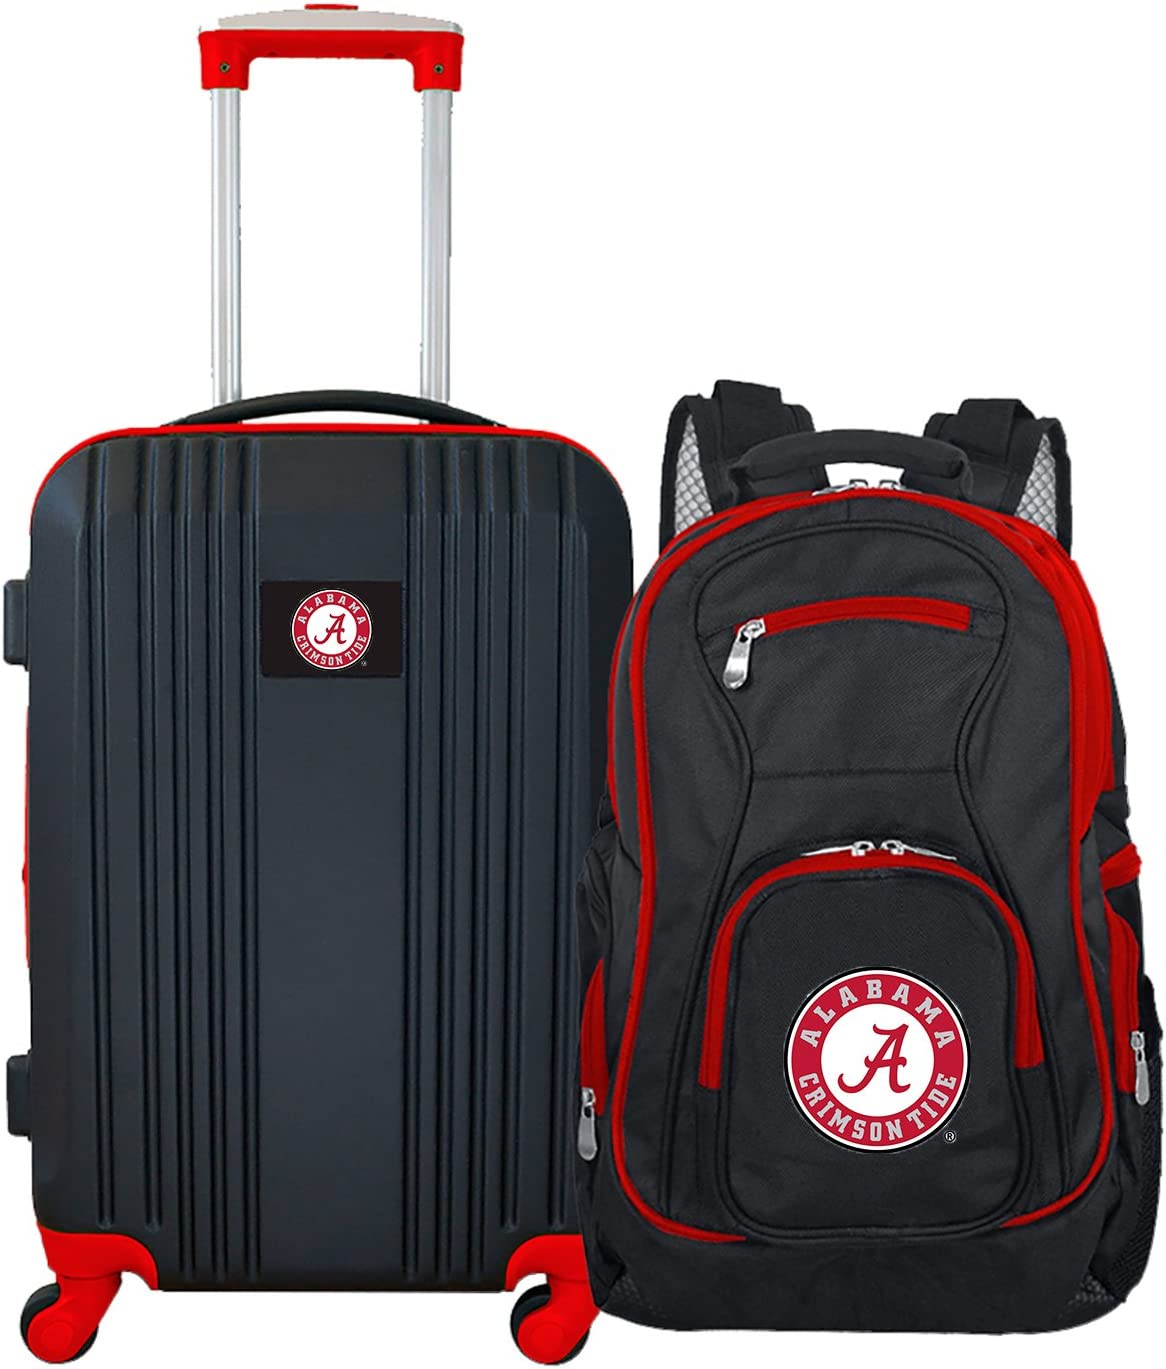 Amazon Com Denco Ncaa Alabama Crimson Tide 2 Piece Luggage Set Black 21 Sports Outdoors